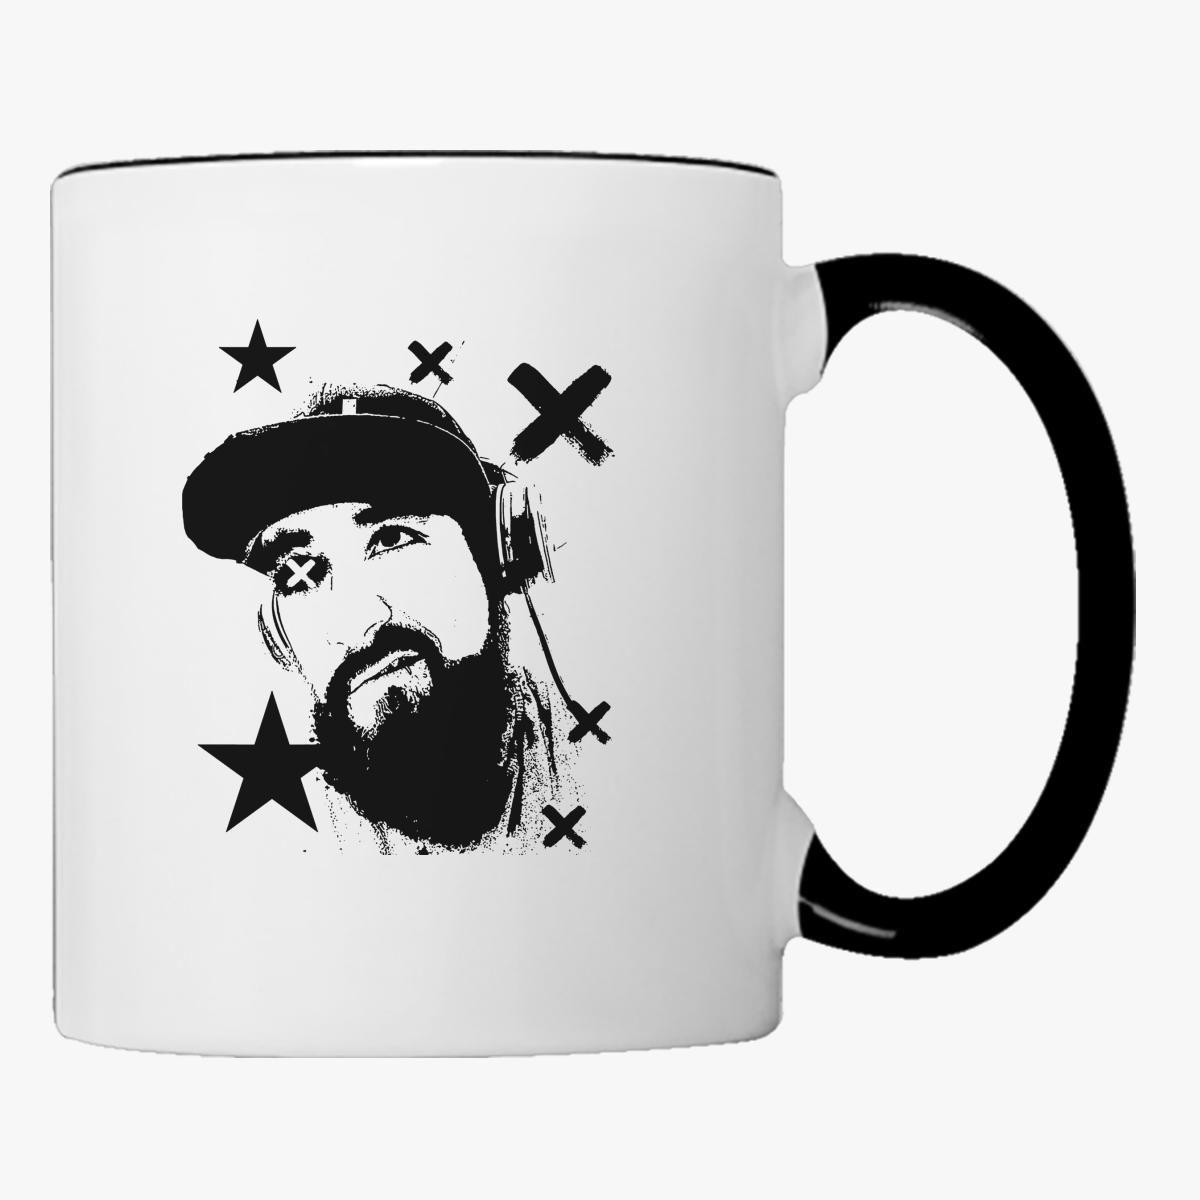 Creeper Man Coffee Mug - Customon